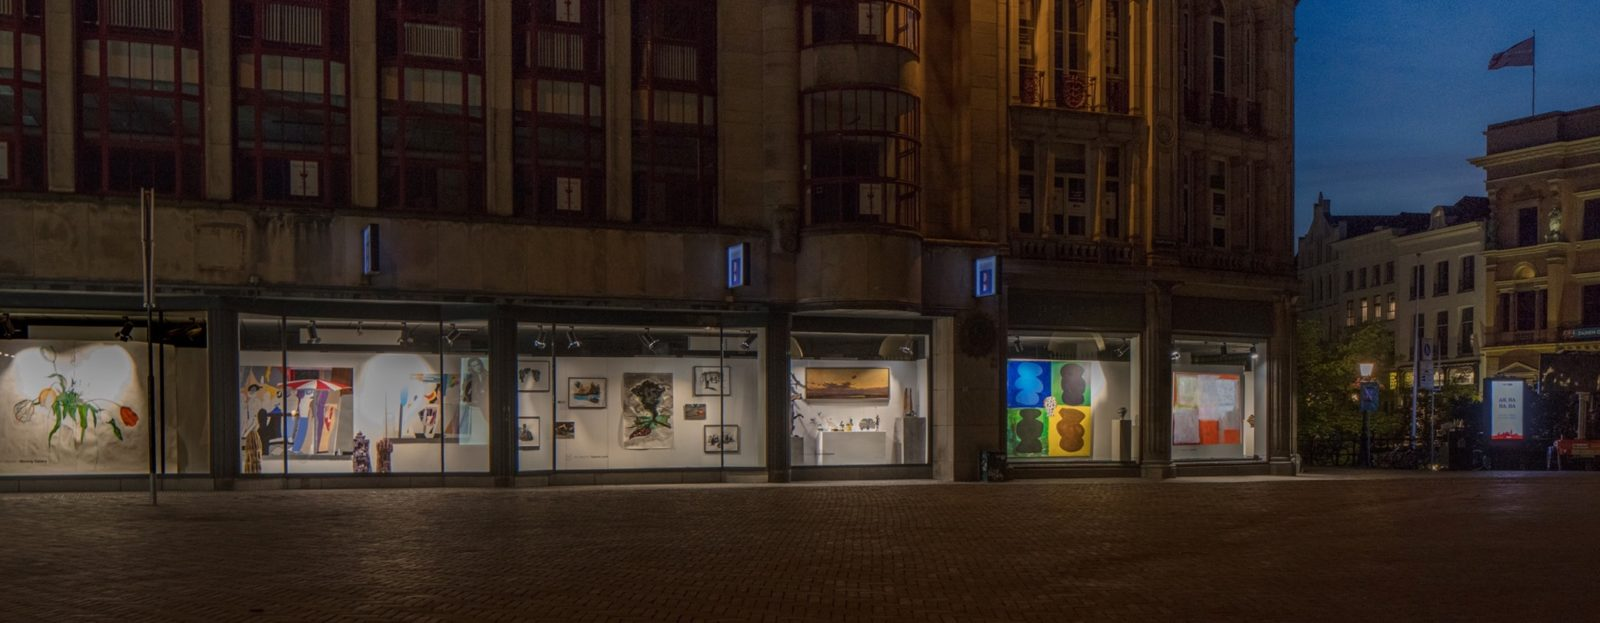 Art Utrecht / Broese – Etalage Expo